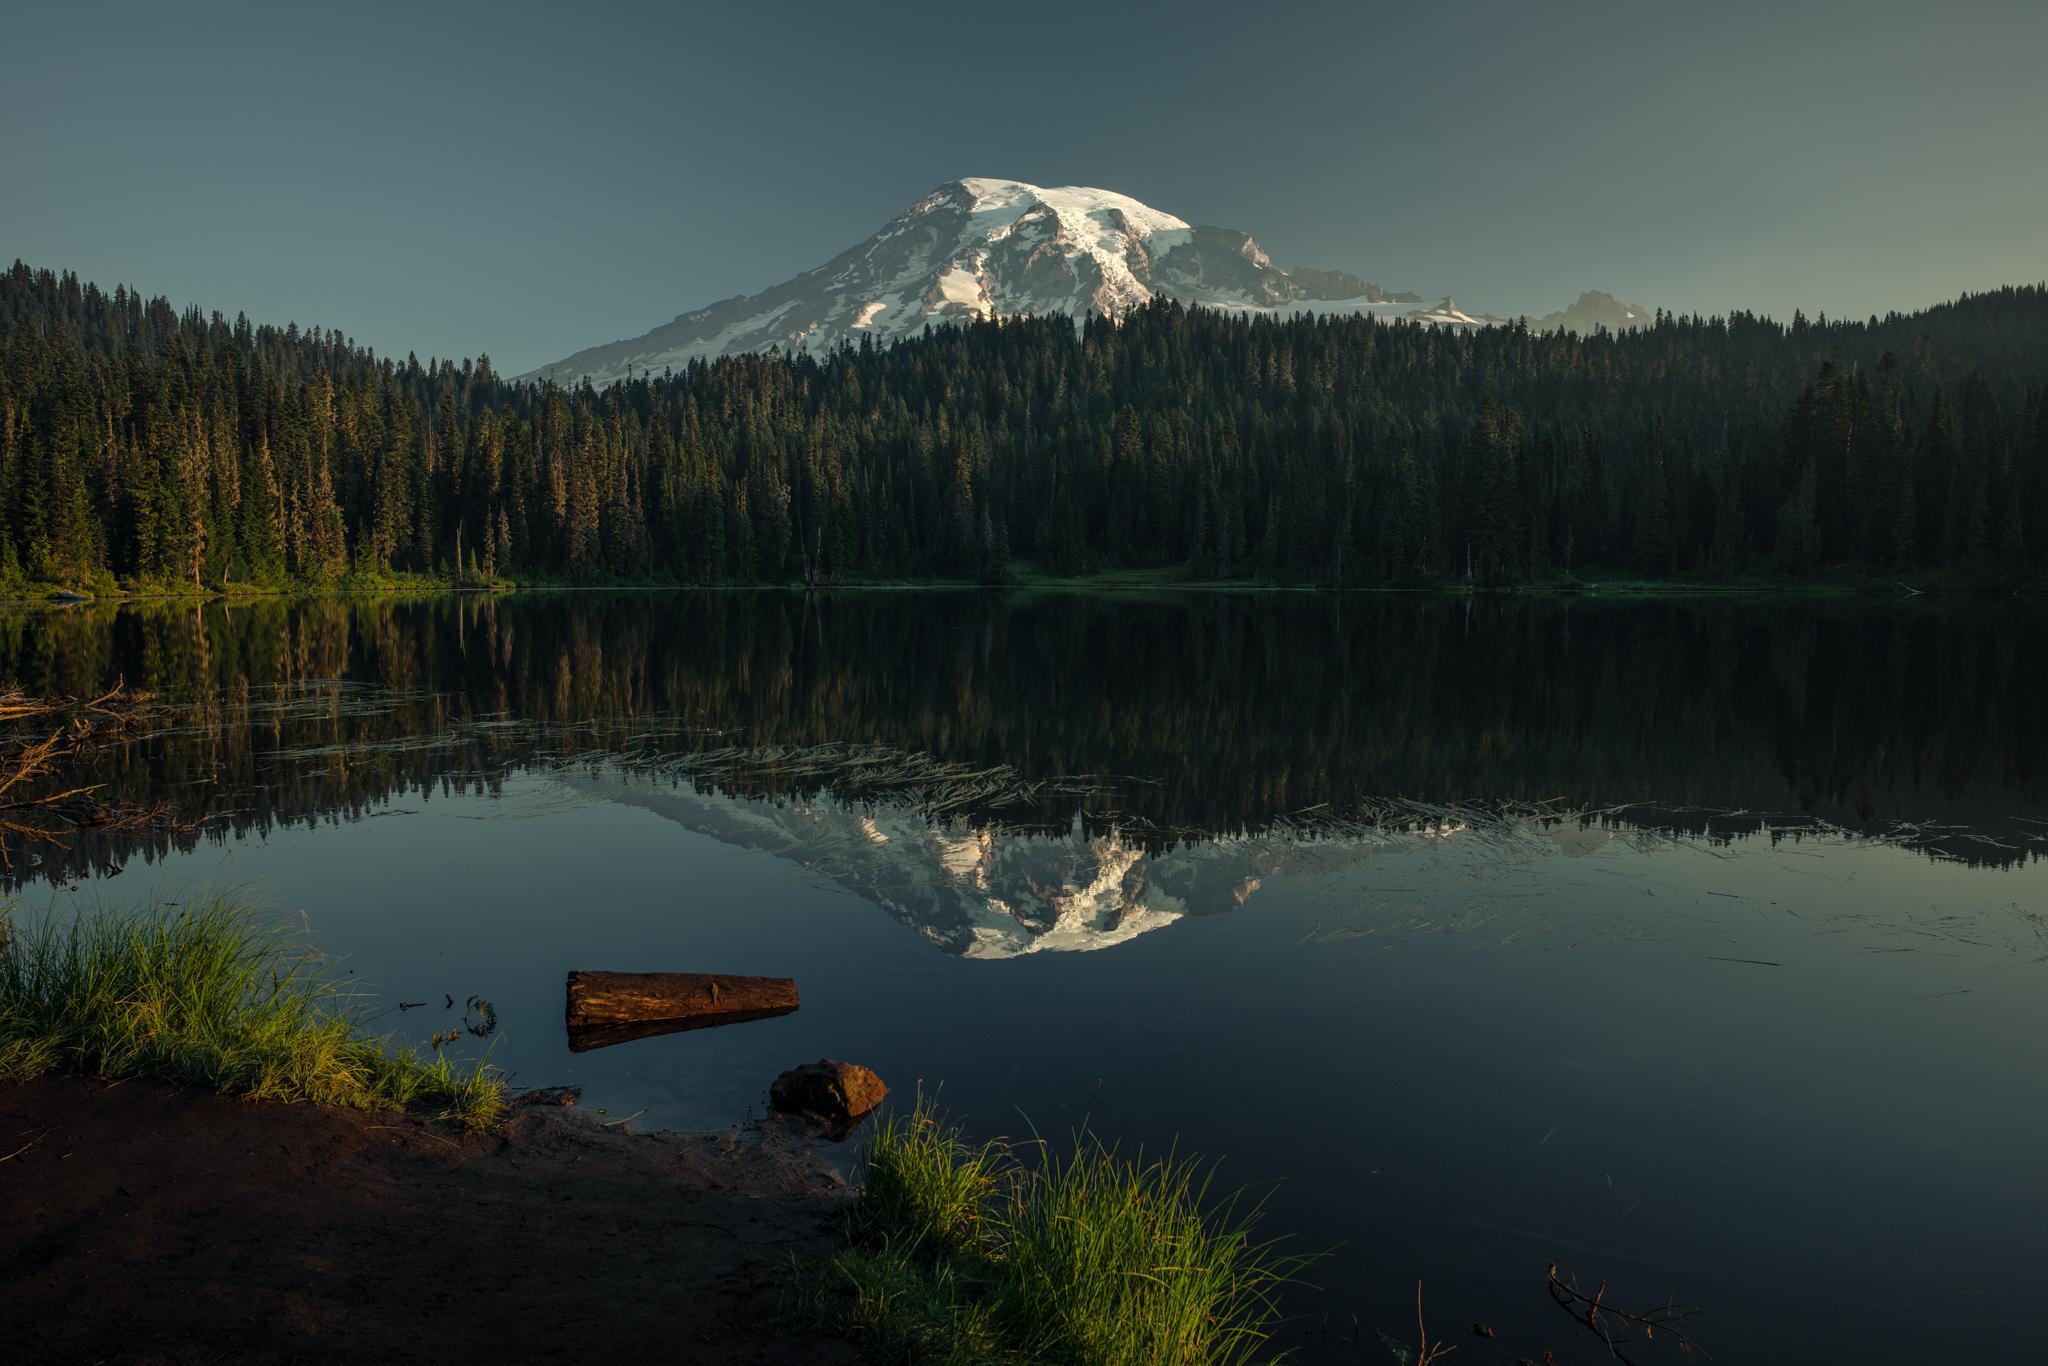 MOUNT RAINIER / REFLECTION LAKE